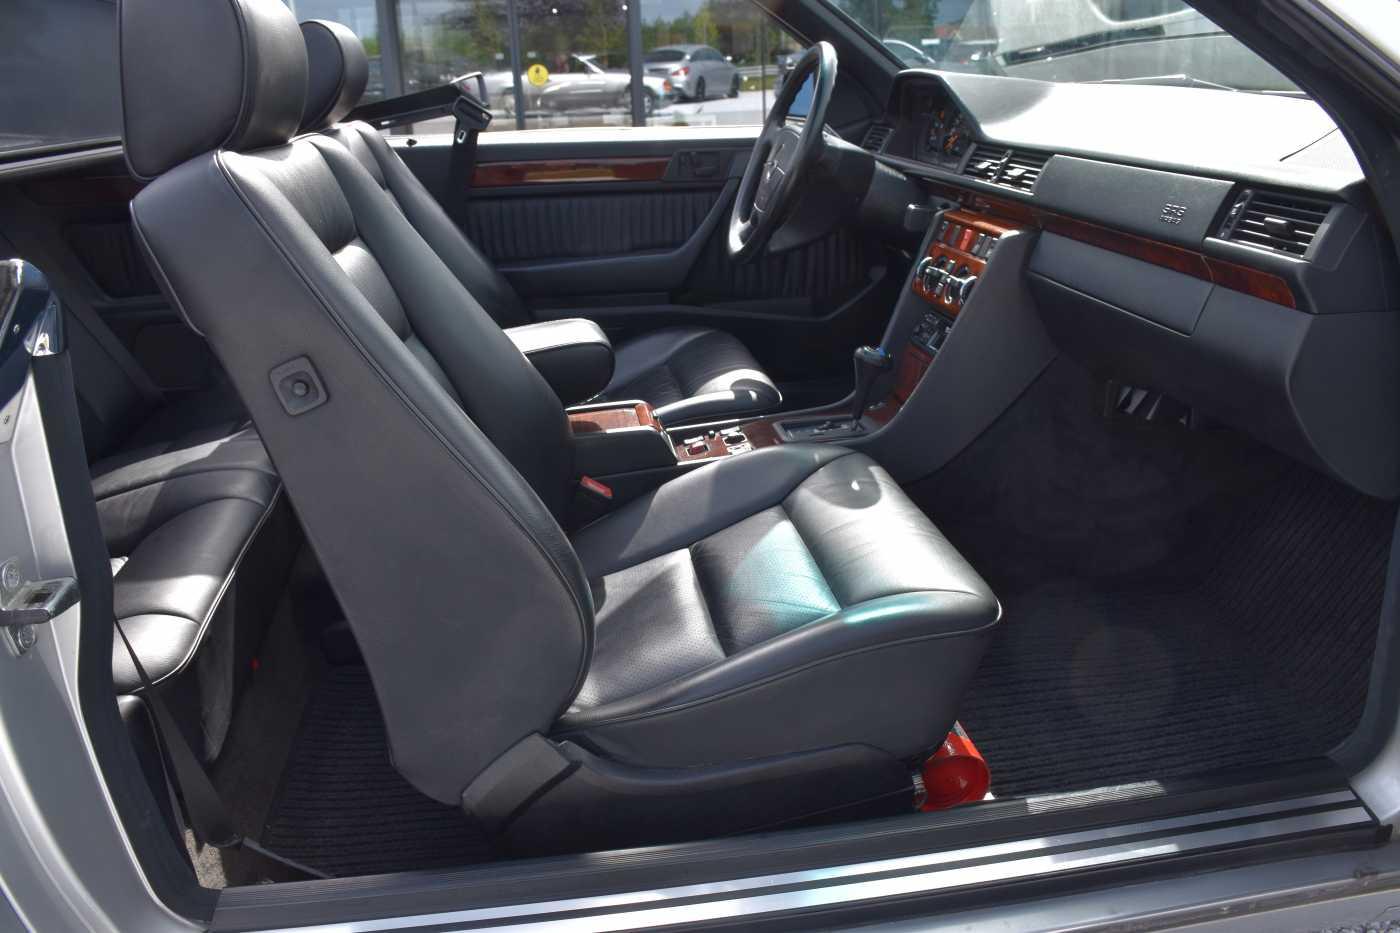 Mercedes CE 300 24 Cabrio Sportline*Airco 11/20